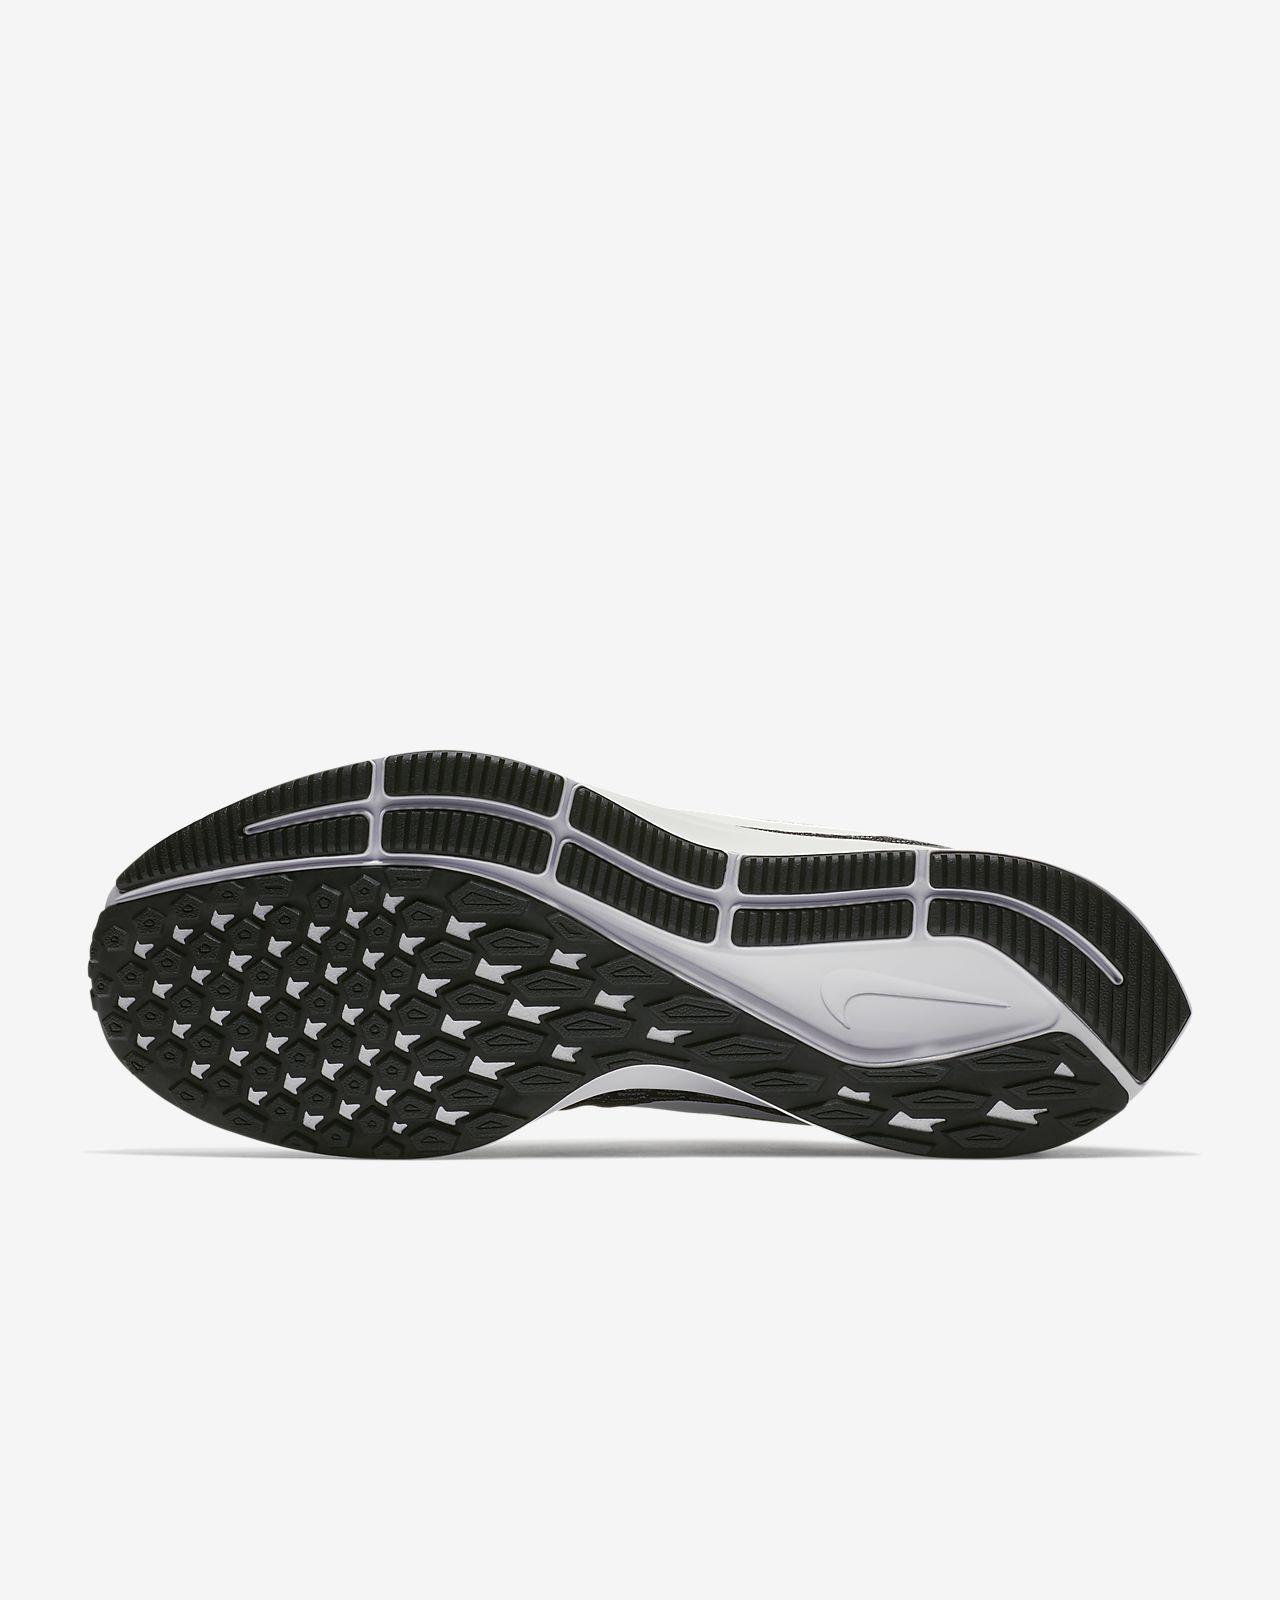 4147eac1a1486 Nike Air Zoom Pegasus 35 Men s Running Shoe. Nike.com GB